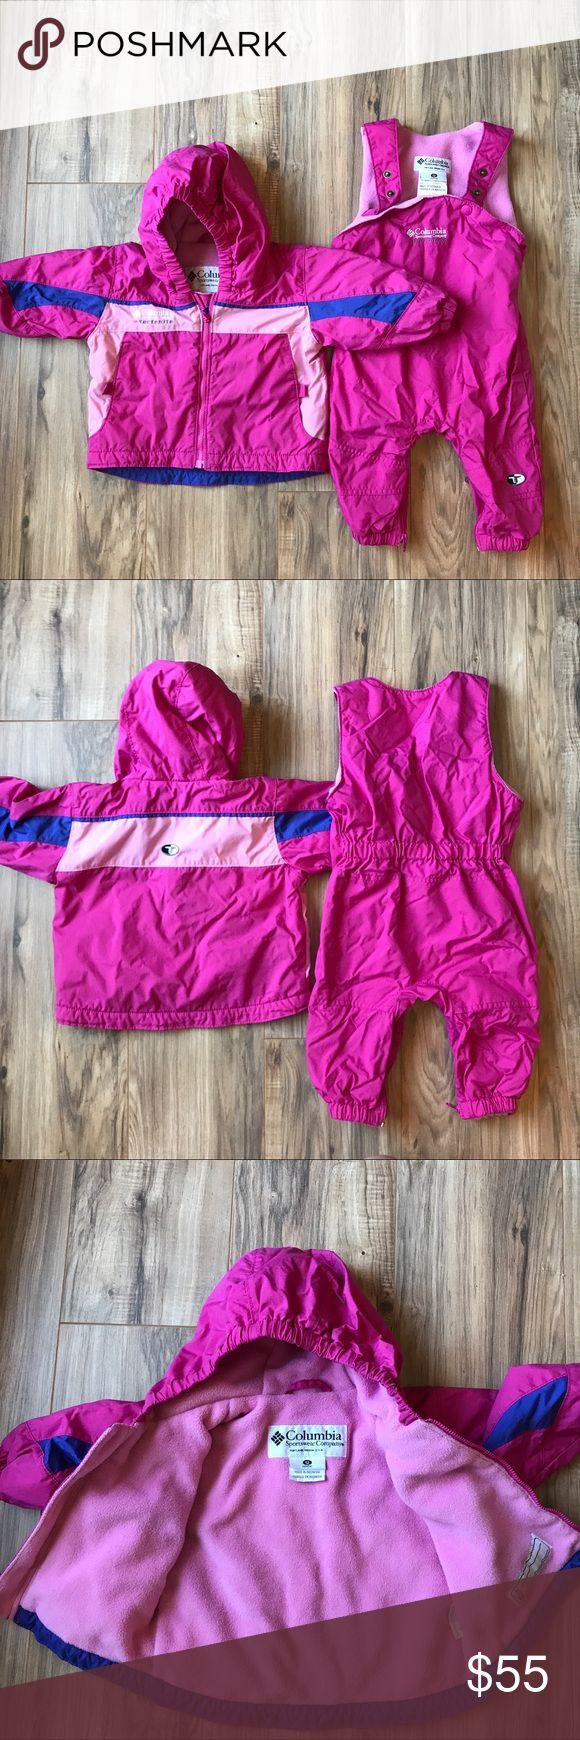 Girls Columbia Sportswear Ski Bibs and Jacket. 💗 In EUC 💗 Columbia Matching Sets